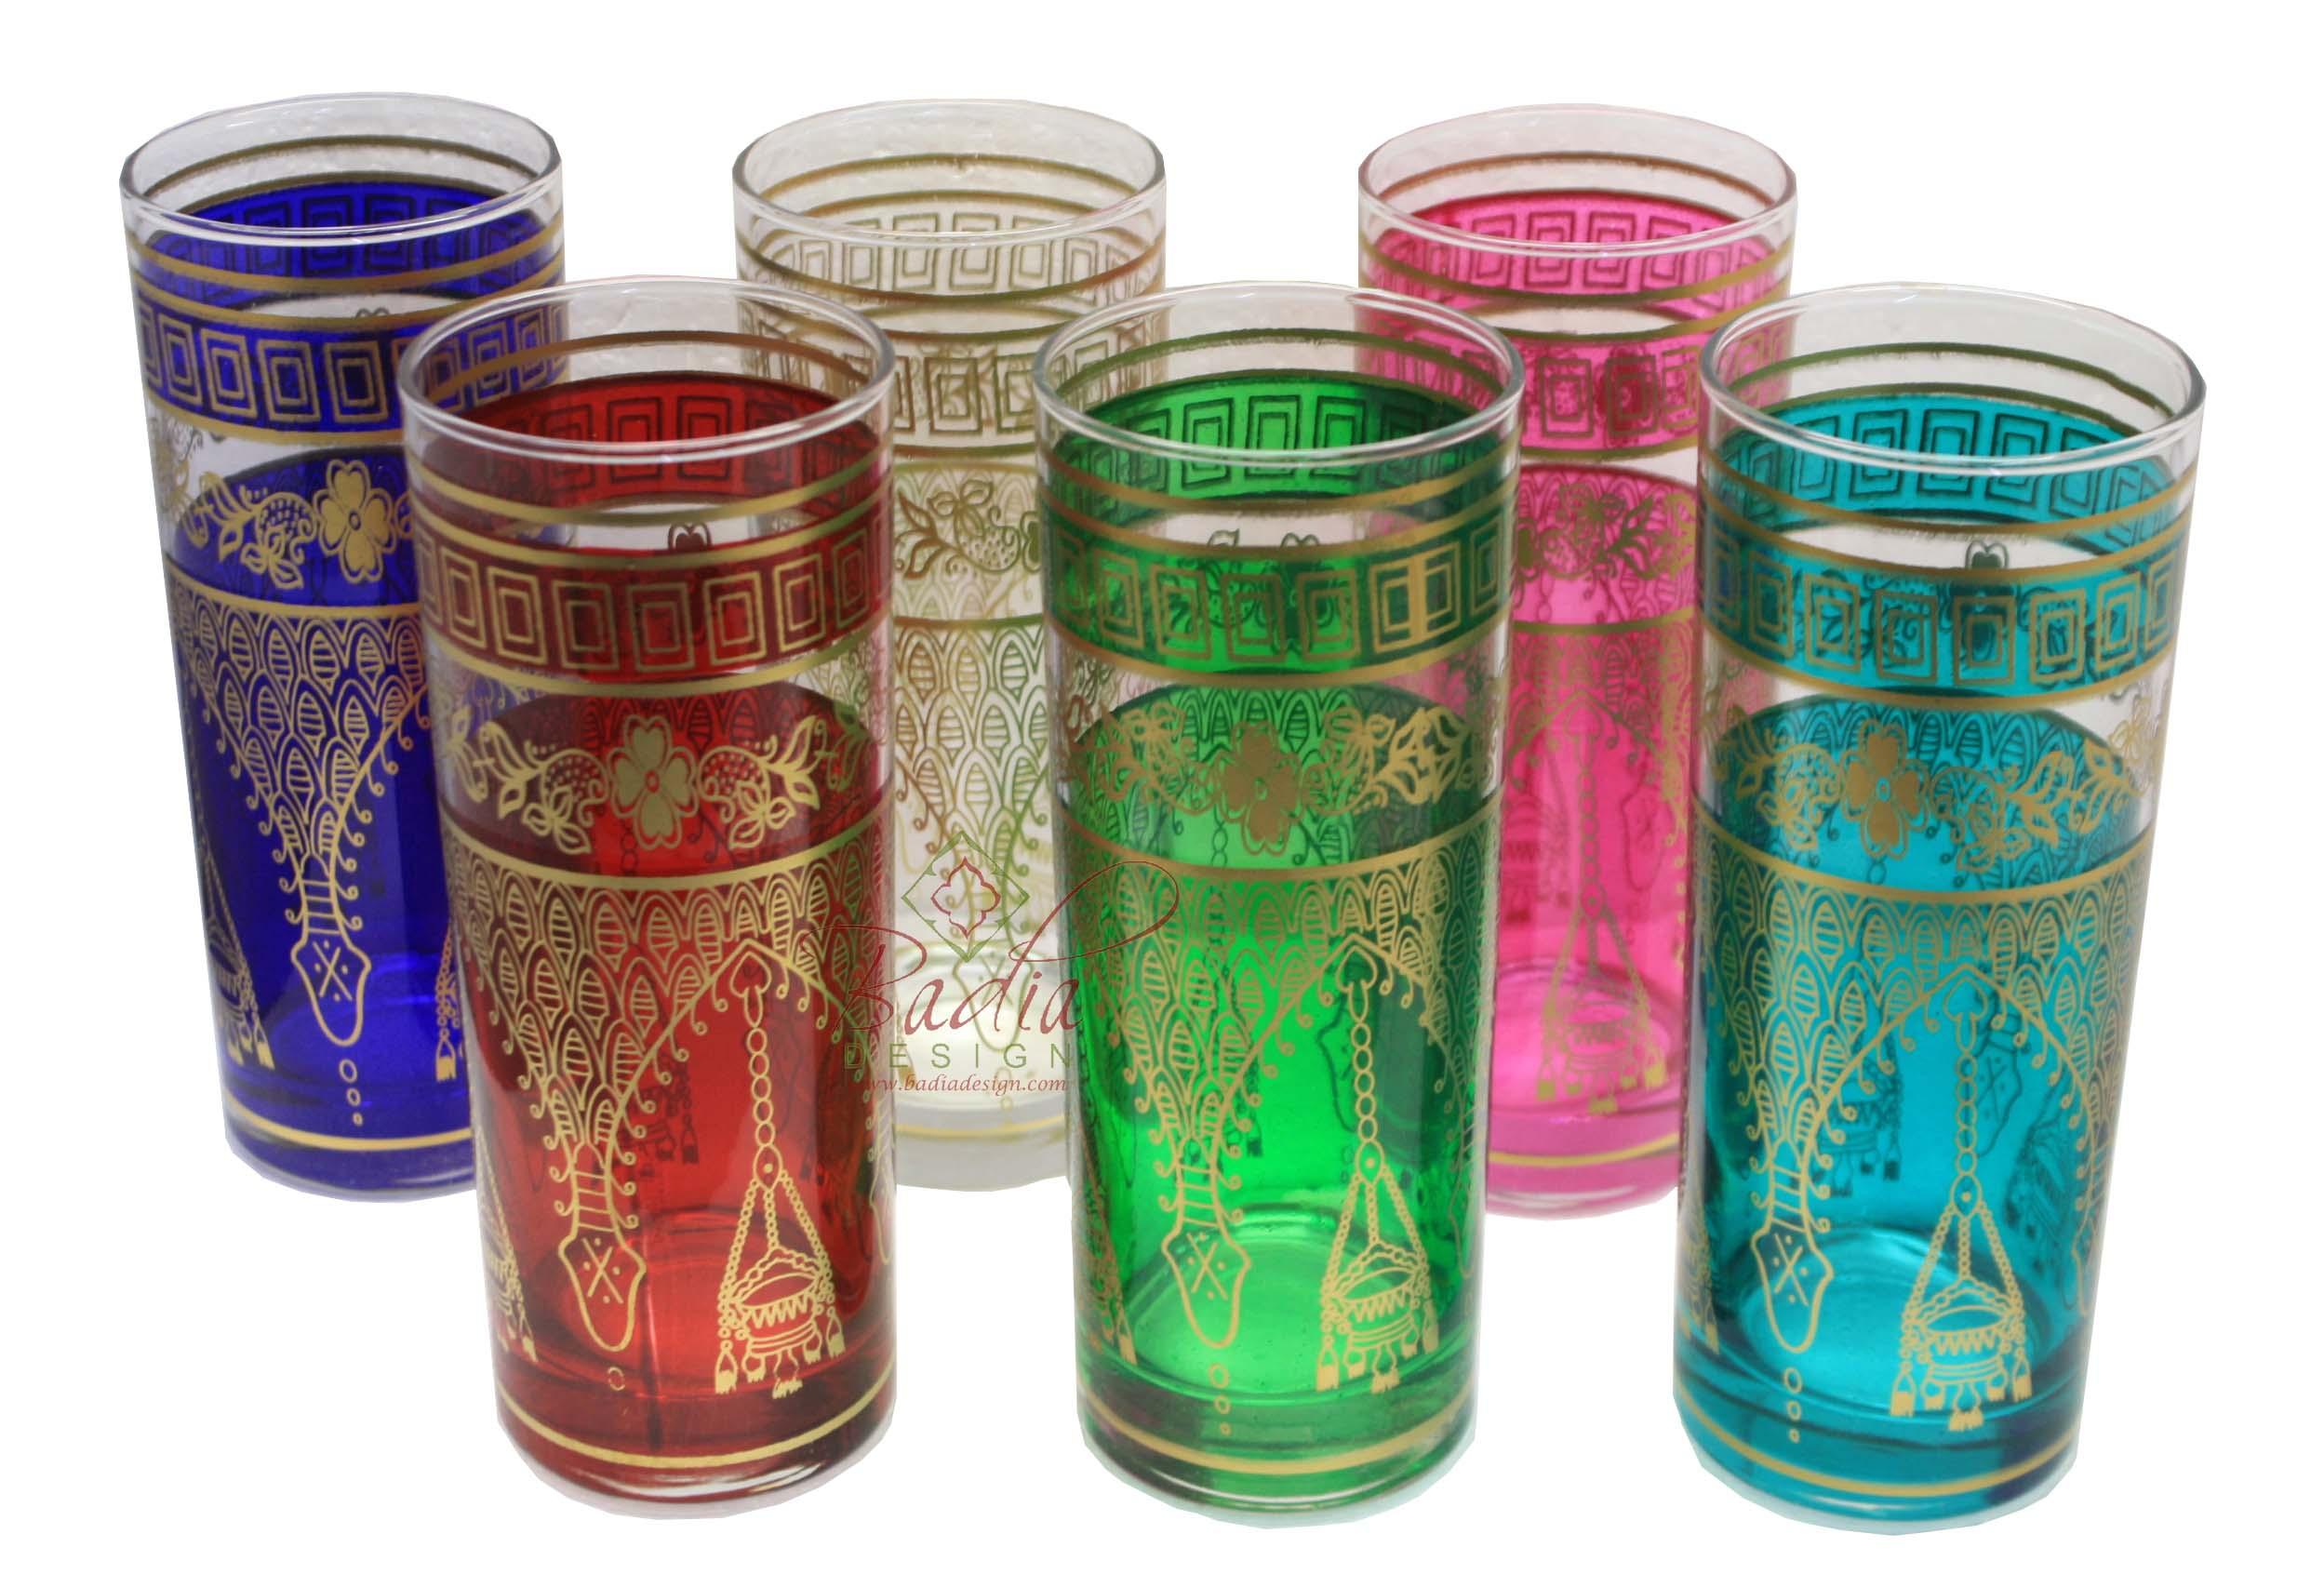 tea-glasses-with-motif-design-tg023.jpg